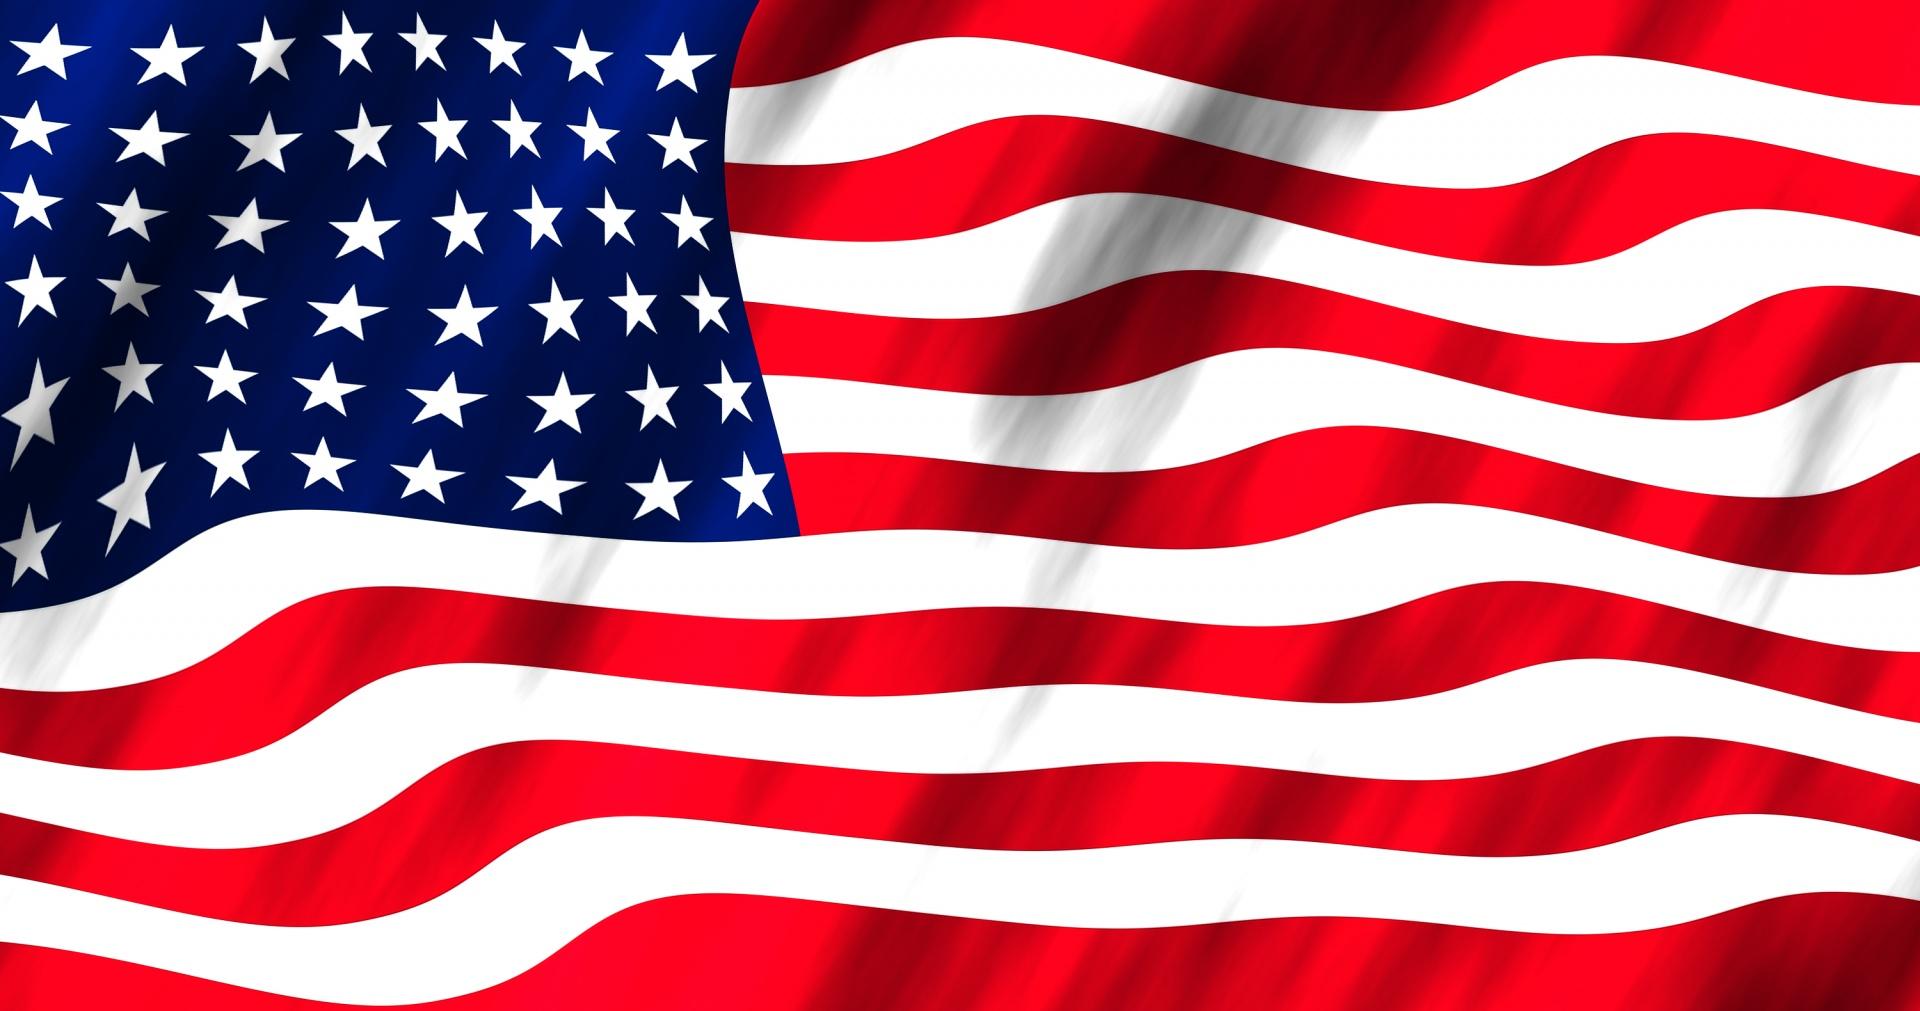 american-flag-1459201553ppe_437571